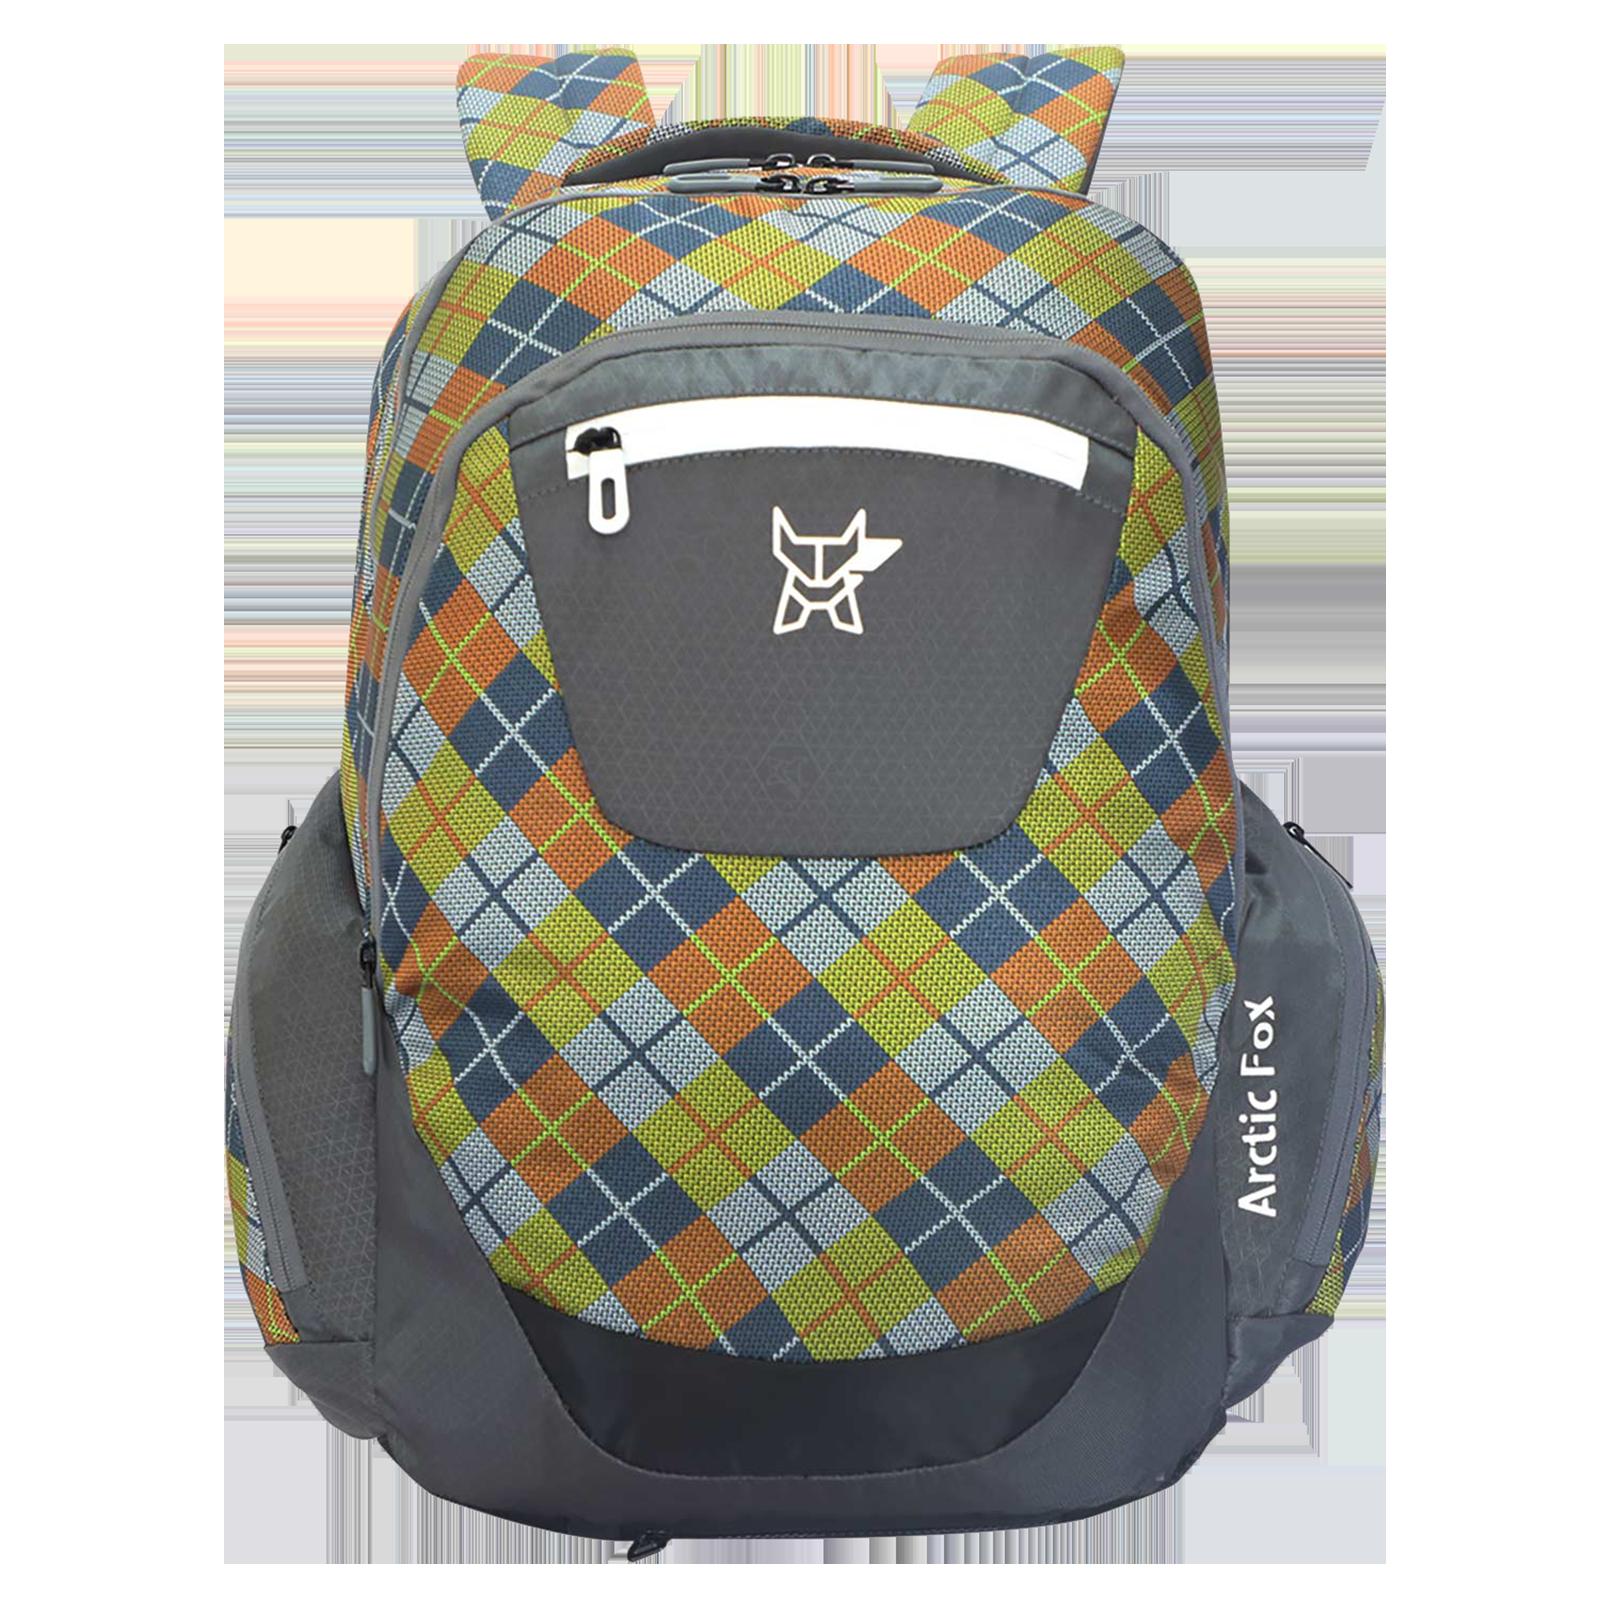 Arctic Fox Scott Checks 33.5 Litres Polyester Backpack (SBS Branded Zippers, FJUBPKCRKON038034, Castle Rock)_1